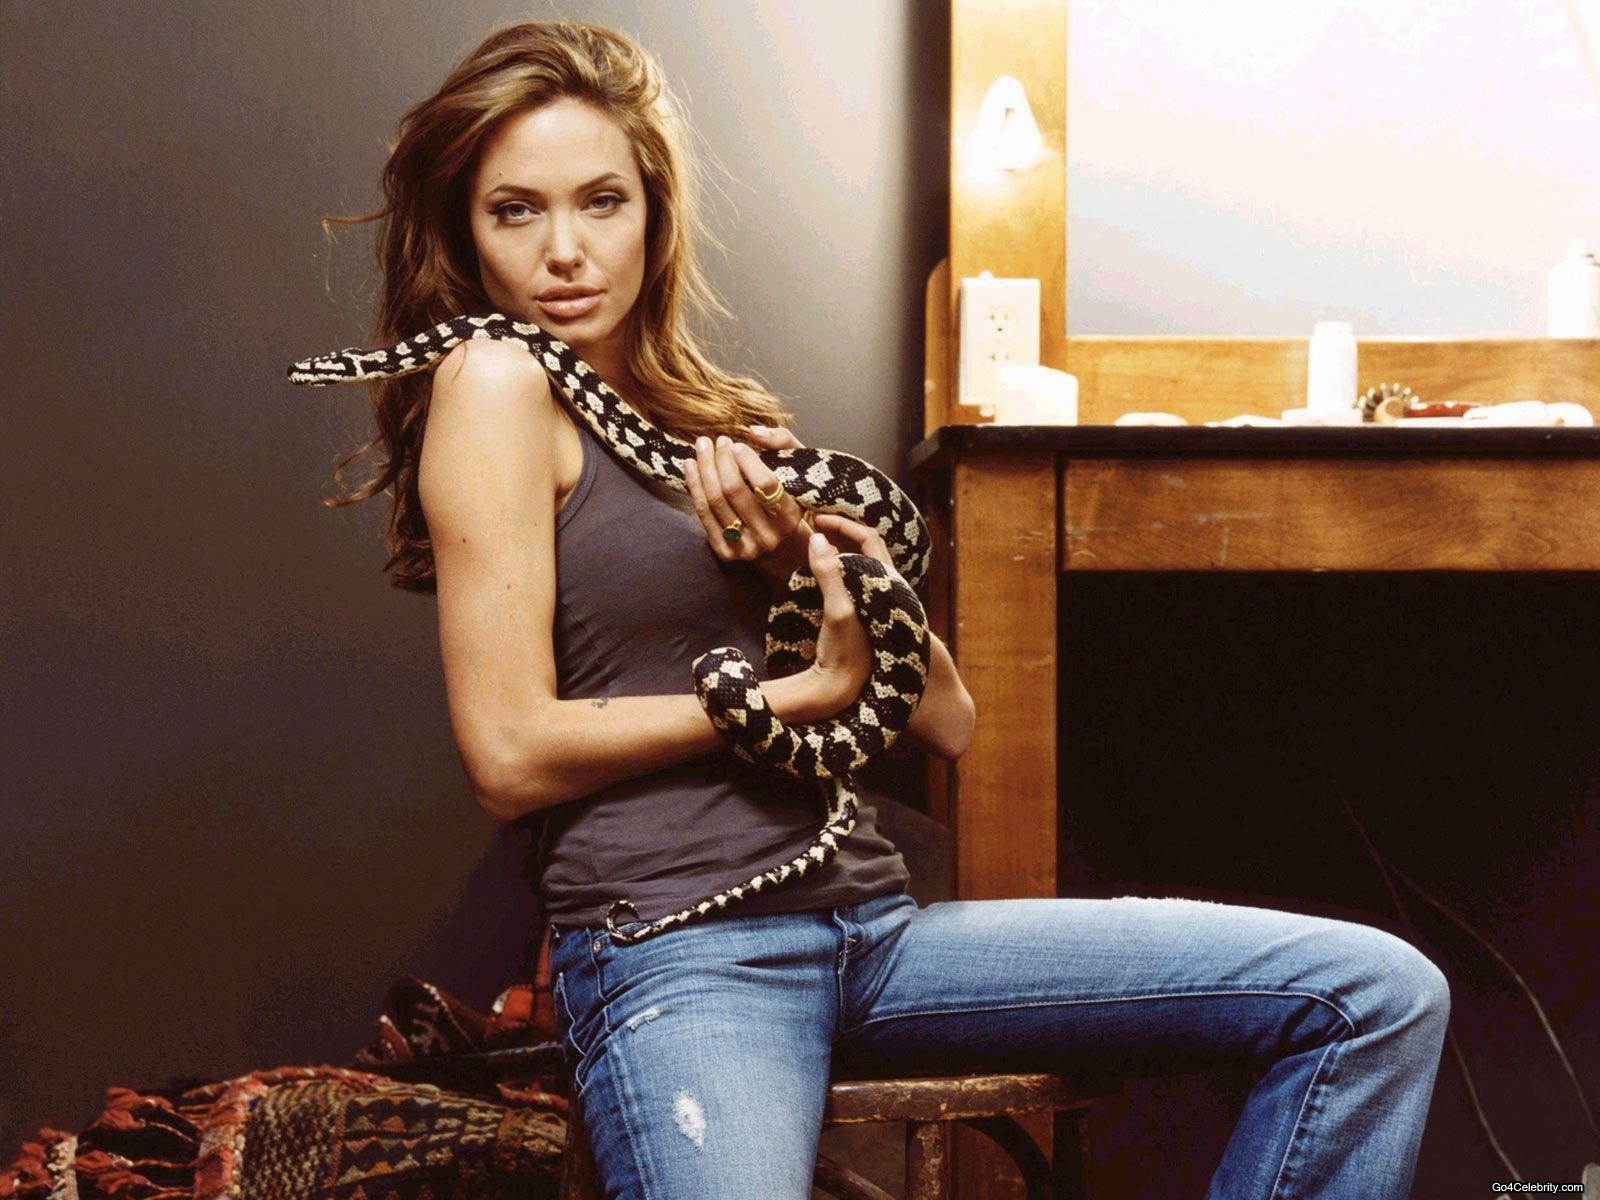 http://2.bp.blogspot.com/-fiv3or30cBg/UBTkdVj5ZeI/AAAAAAAAMa0/ctuIAMeM9pU/s1600/Angelina-Jolie-162.jpg